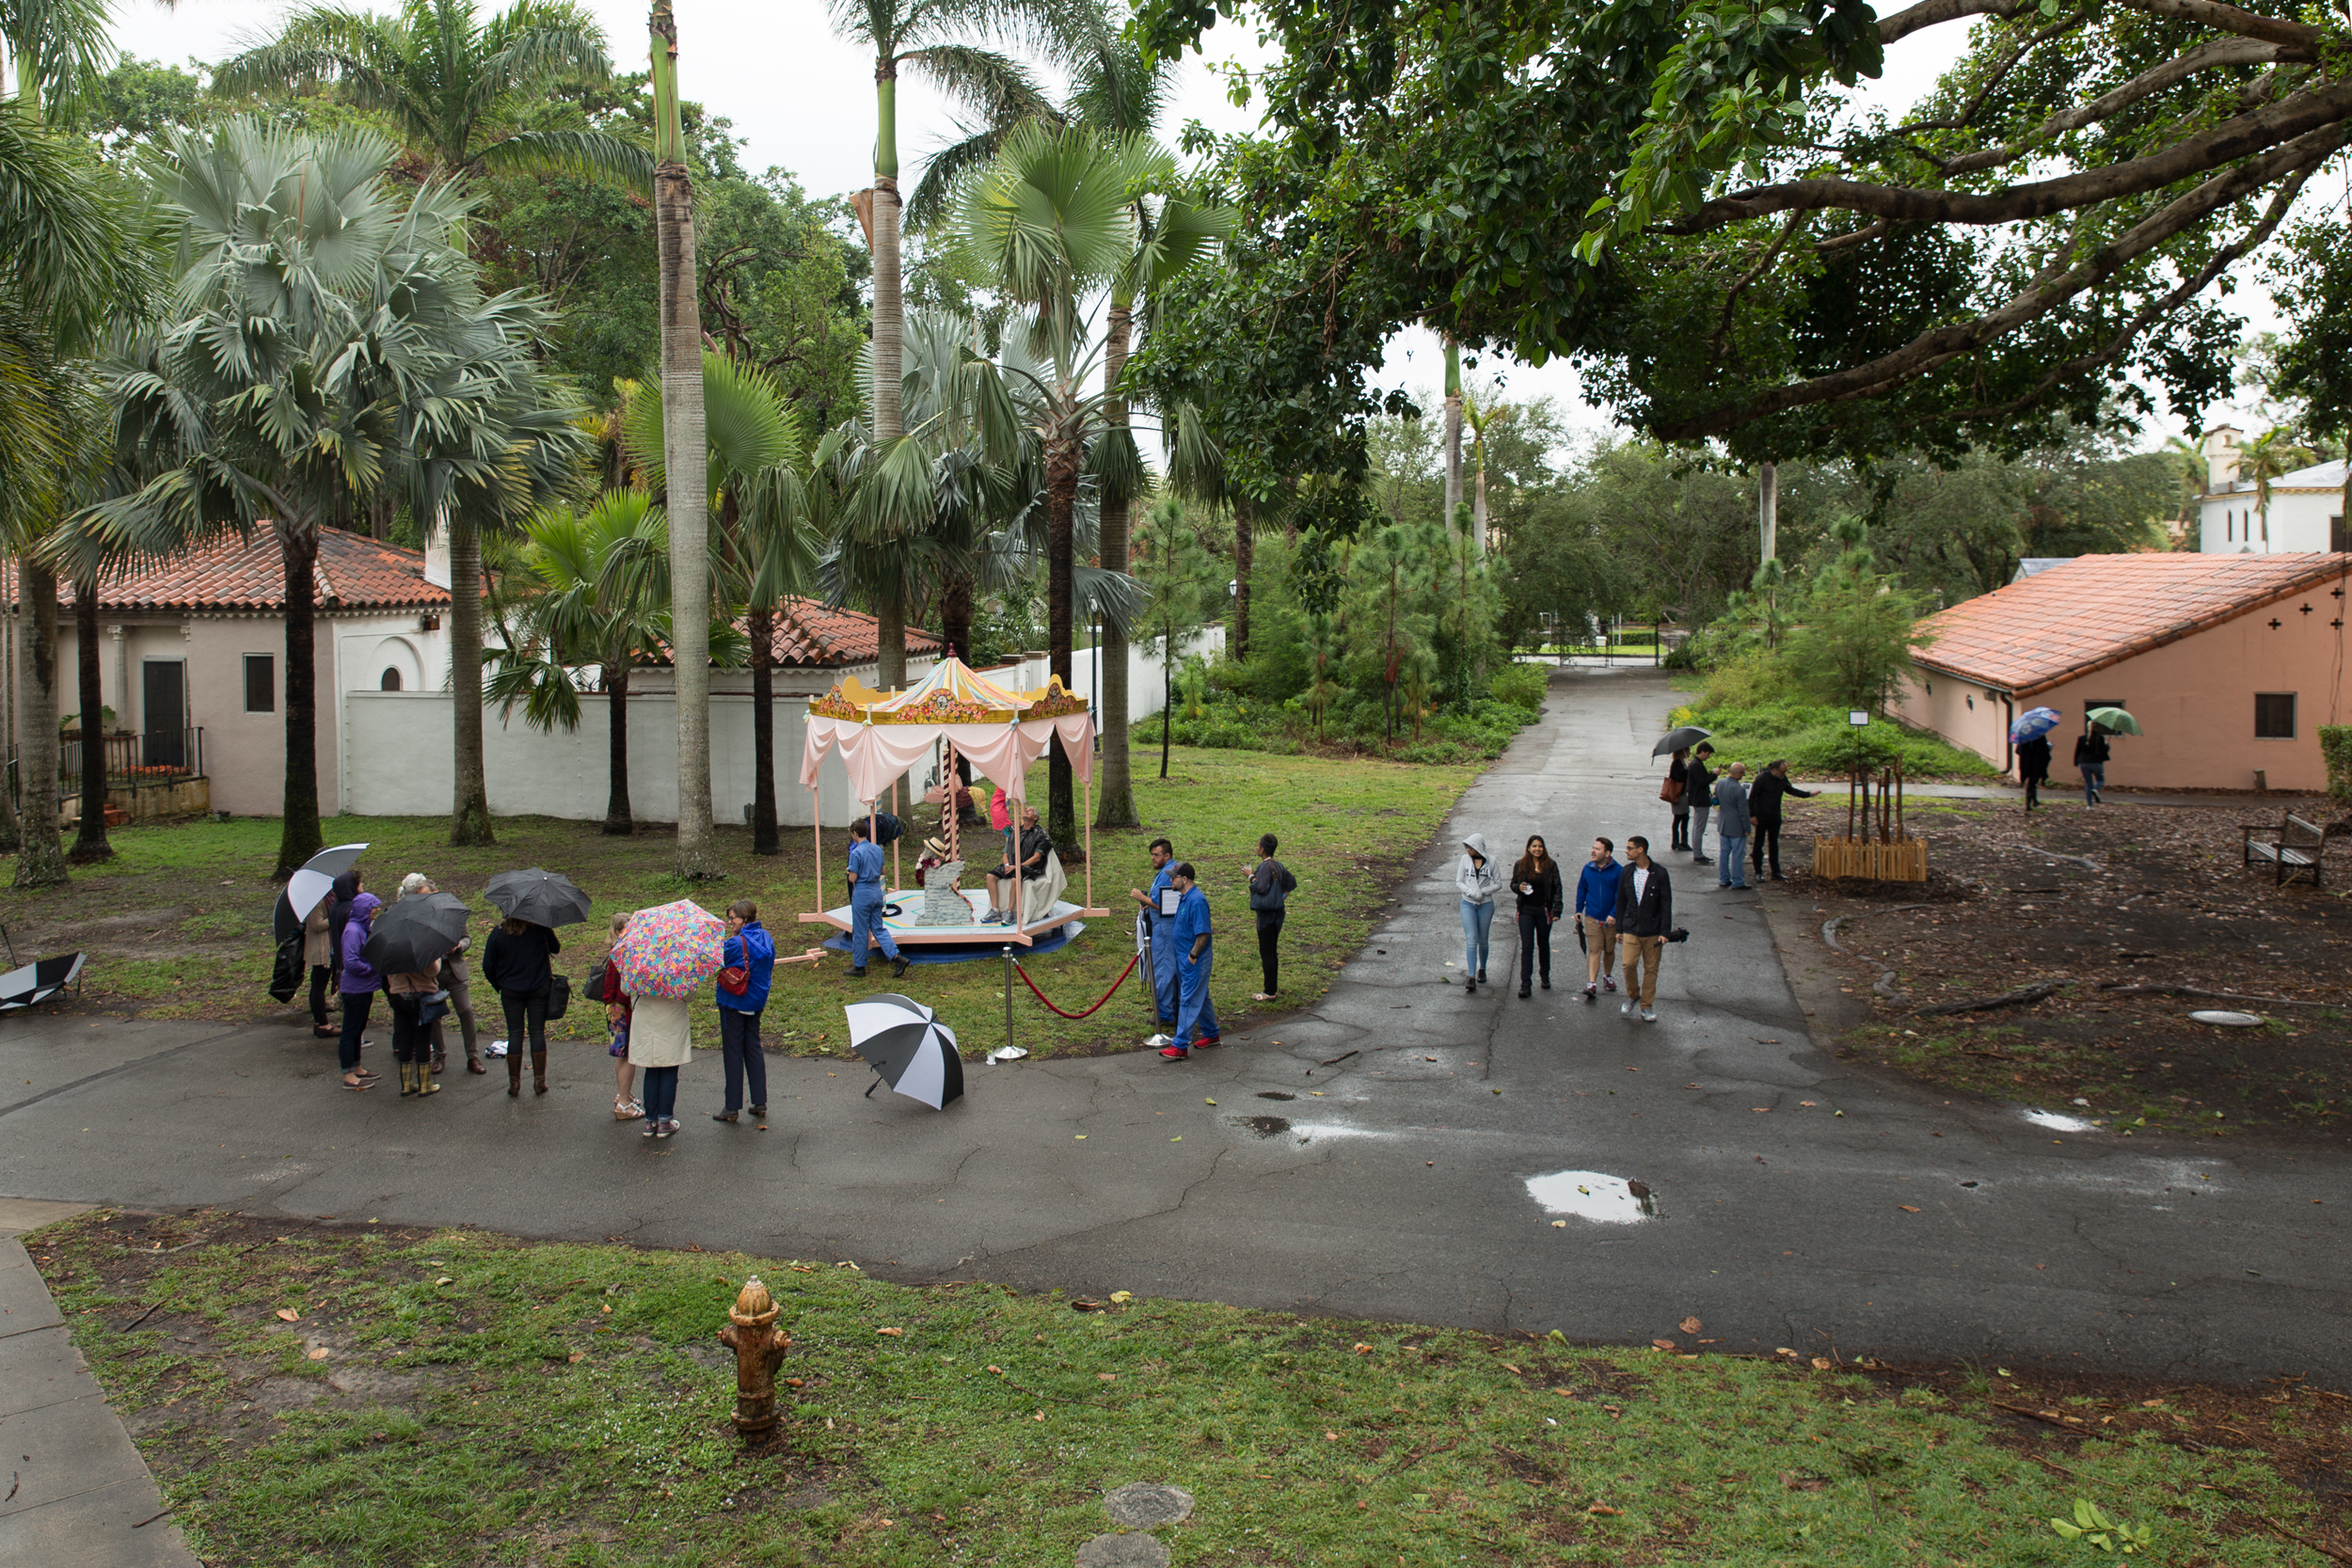 Village Carousel , Vizcaya Museum and Gardens- Miami, FL, December 2017